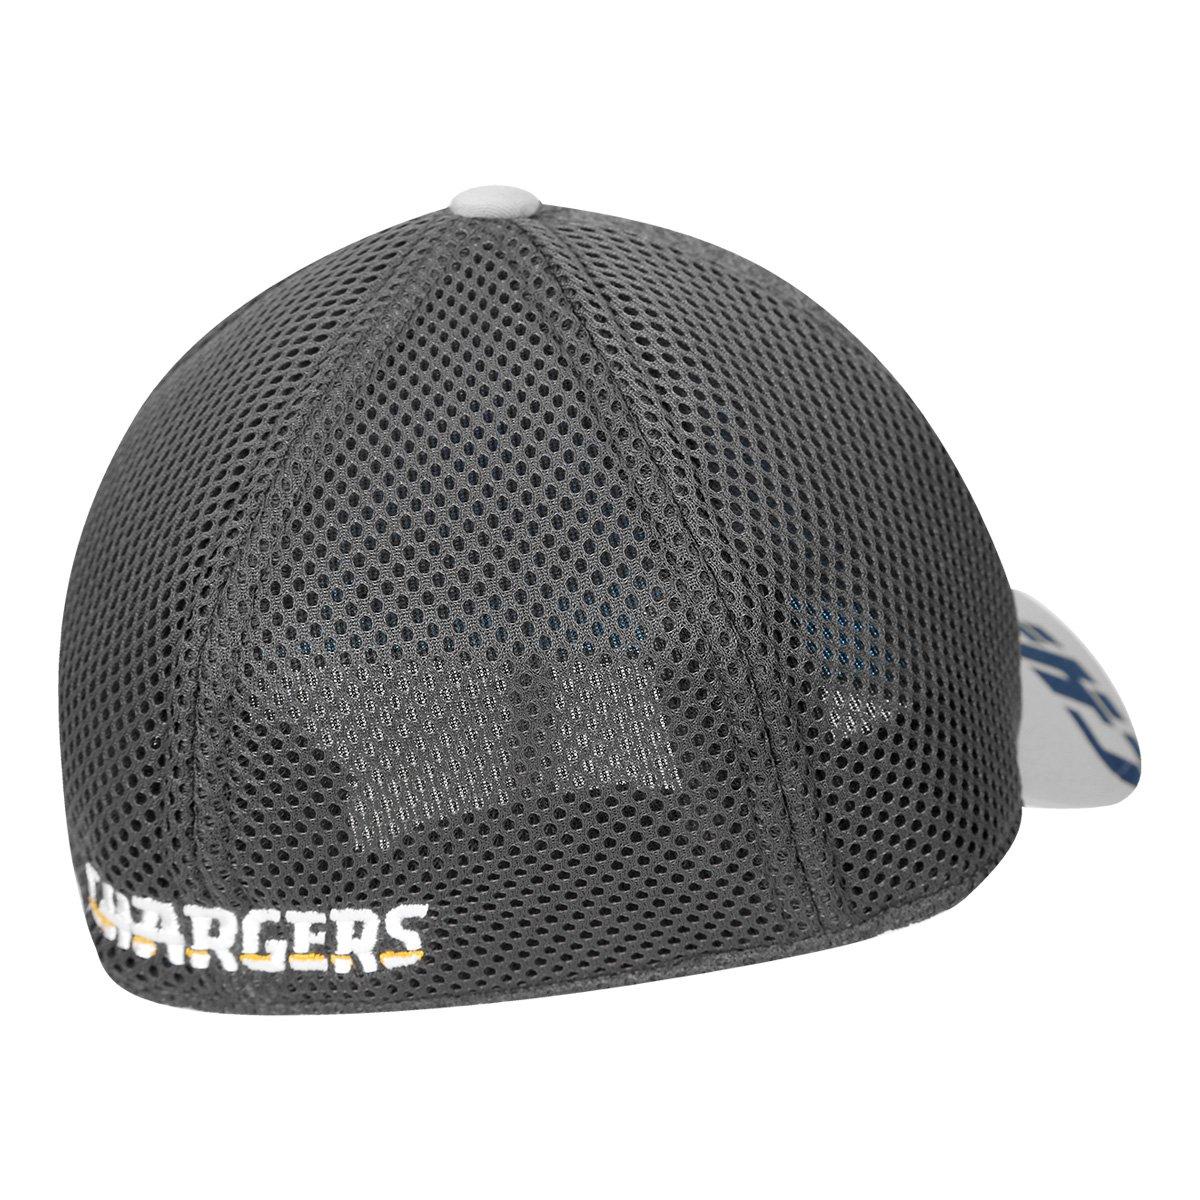 4da8687a0f ... Boné New Era NFL Los Angeles Chargers Aba Curva 3930 Spotlight Masculino  ...